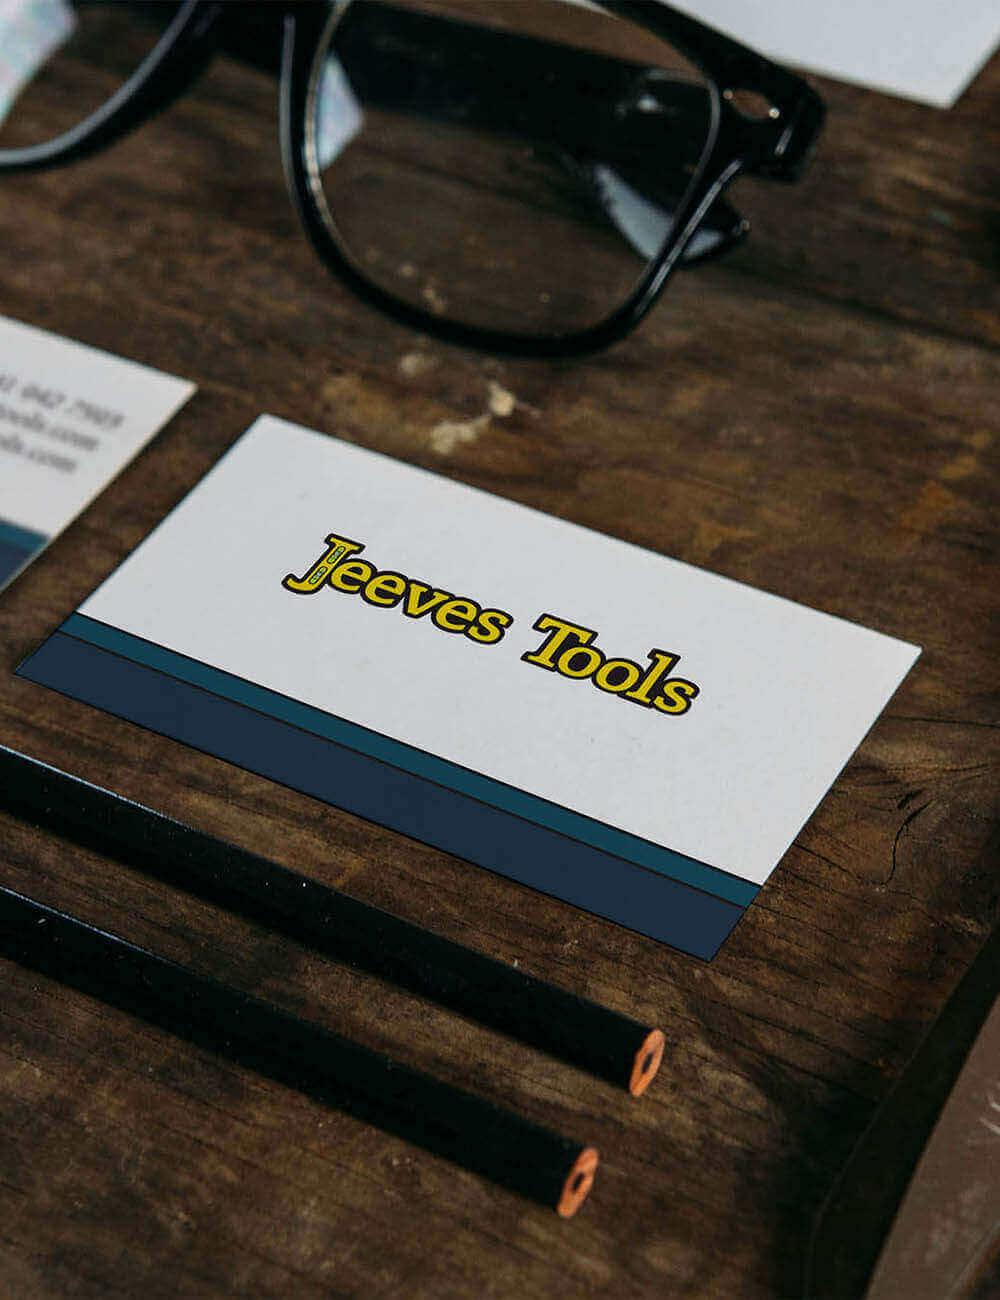 Jeeves Tools UK